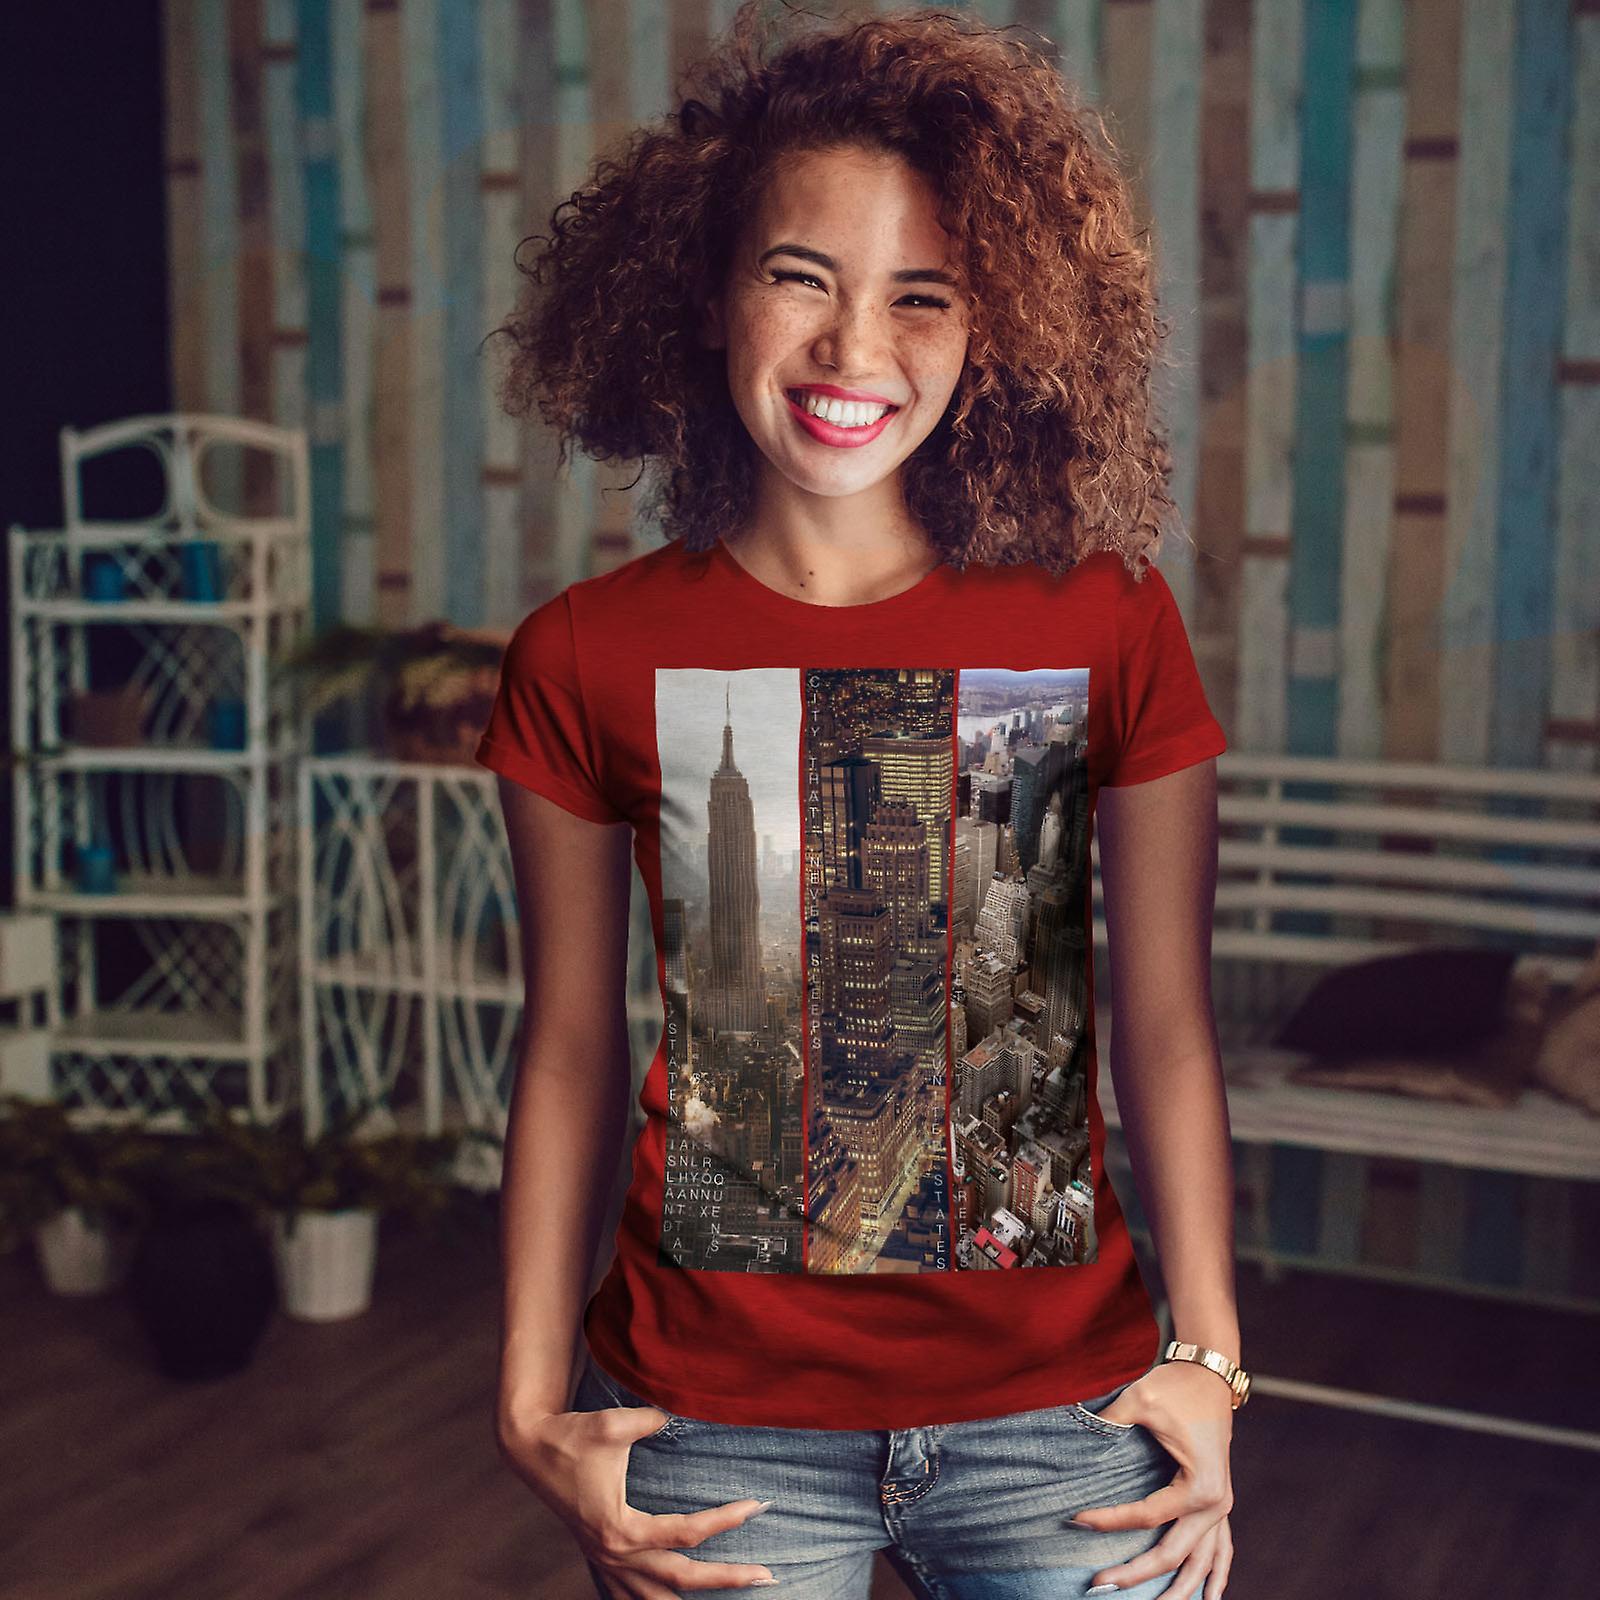 Night City Design RedT-chemise femme   Wellcoda